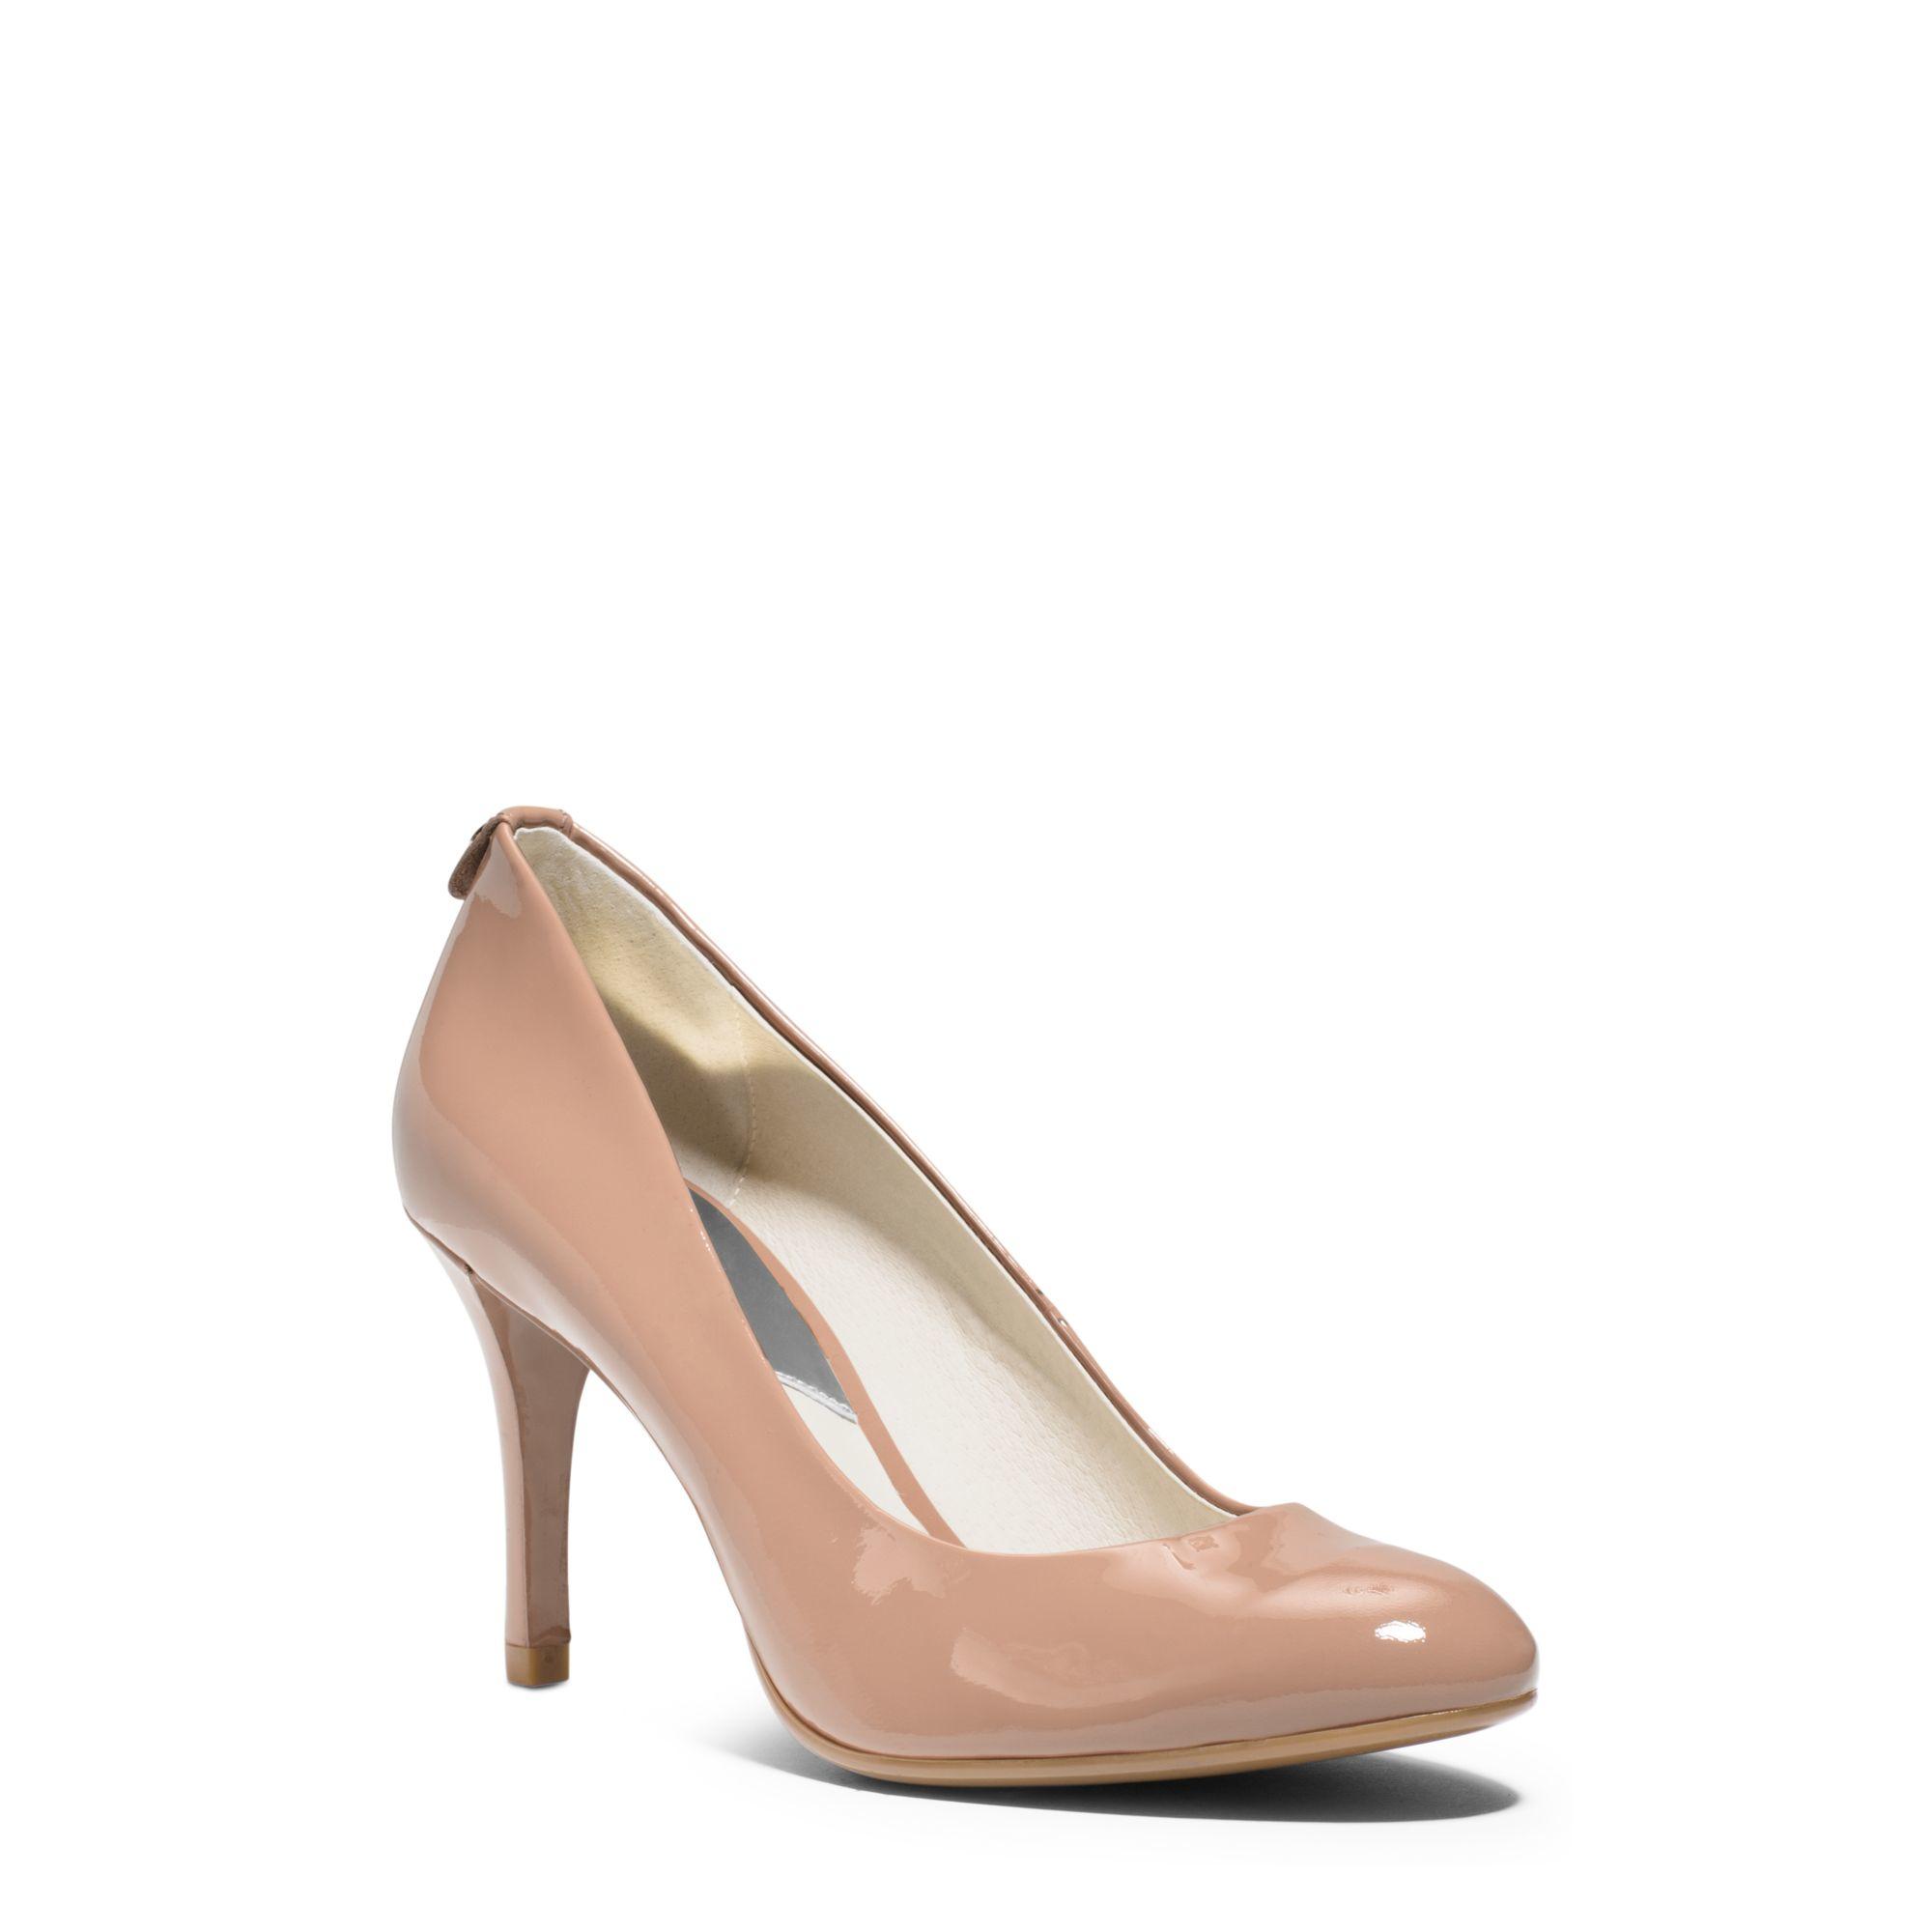 Lyst - Michael Kors Flex Patent-leather Mid-heel Pump in Pink